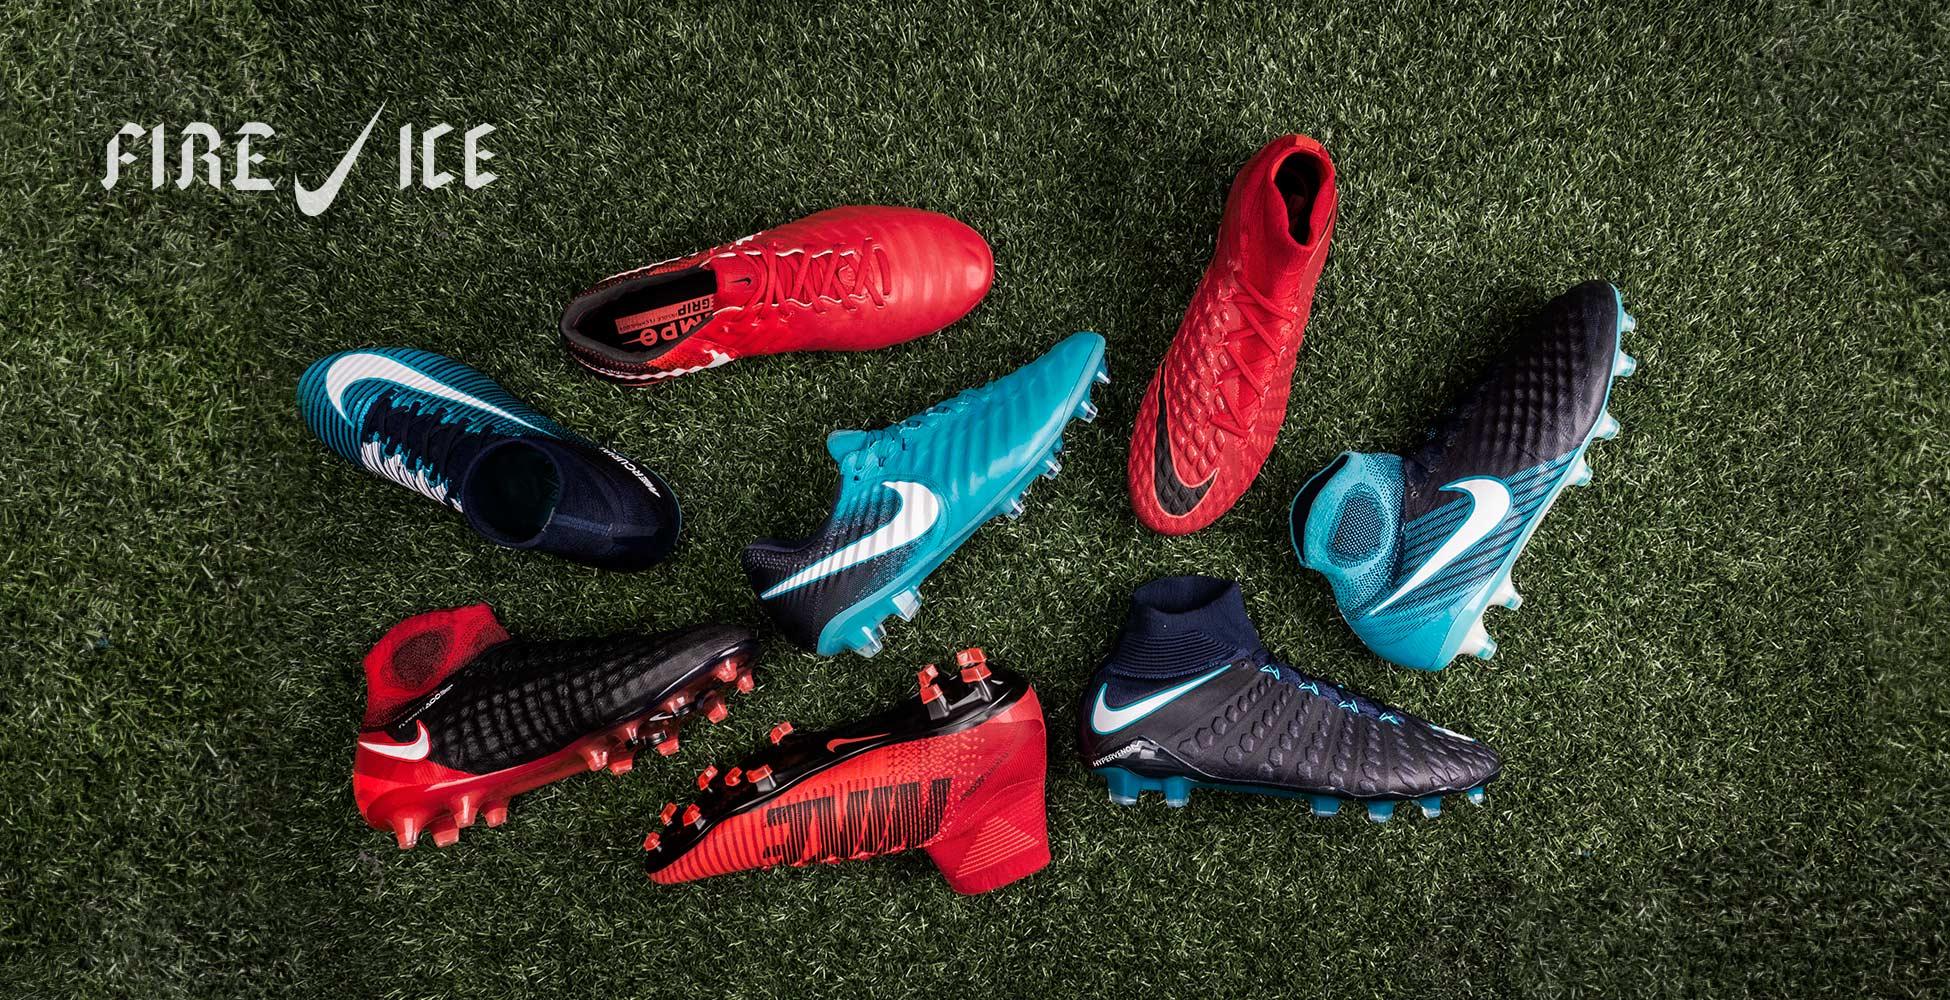 Nike Fire \u0026amp; Ice - Football store